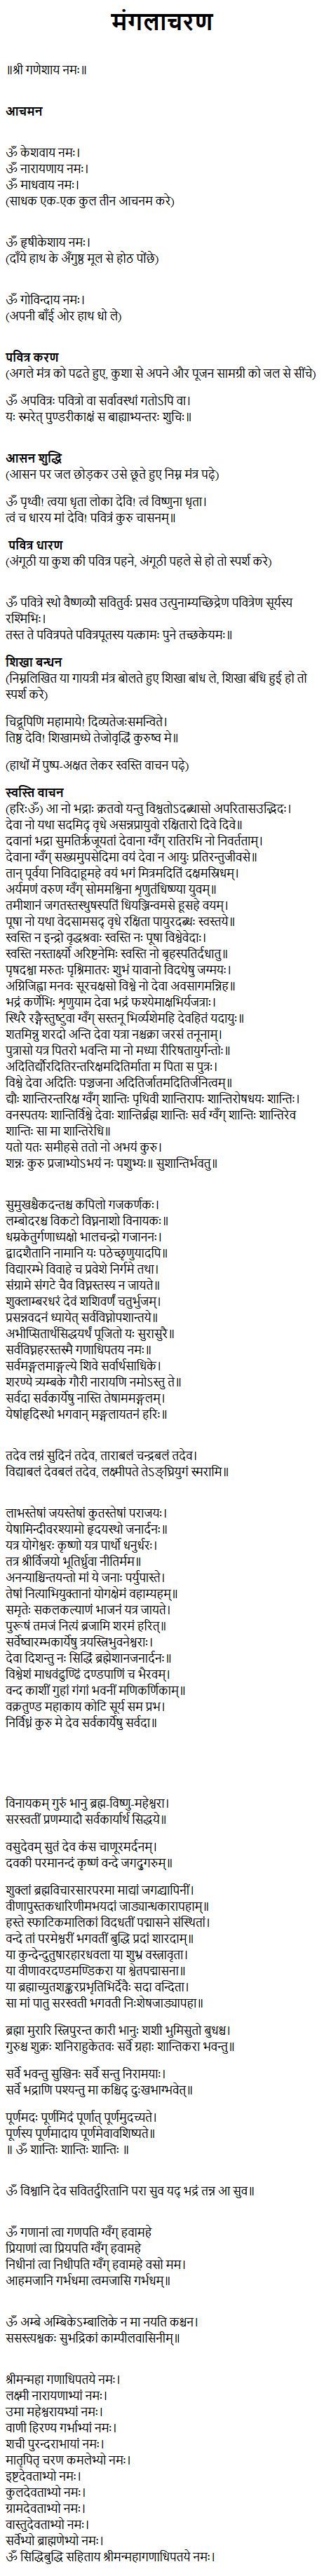 mangalacharan lyrics